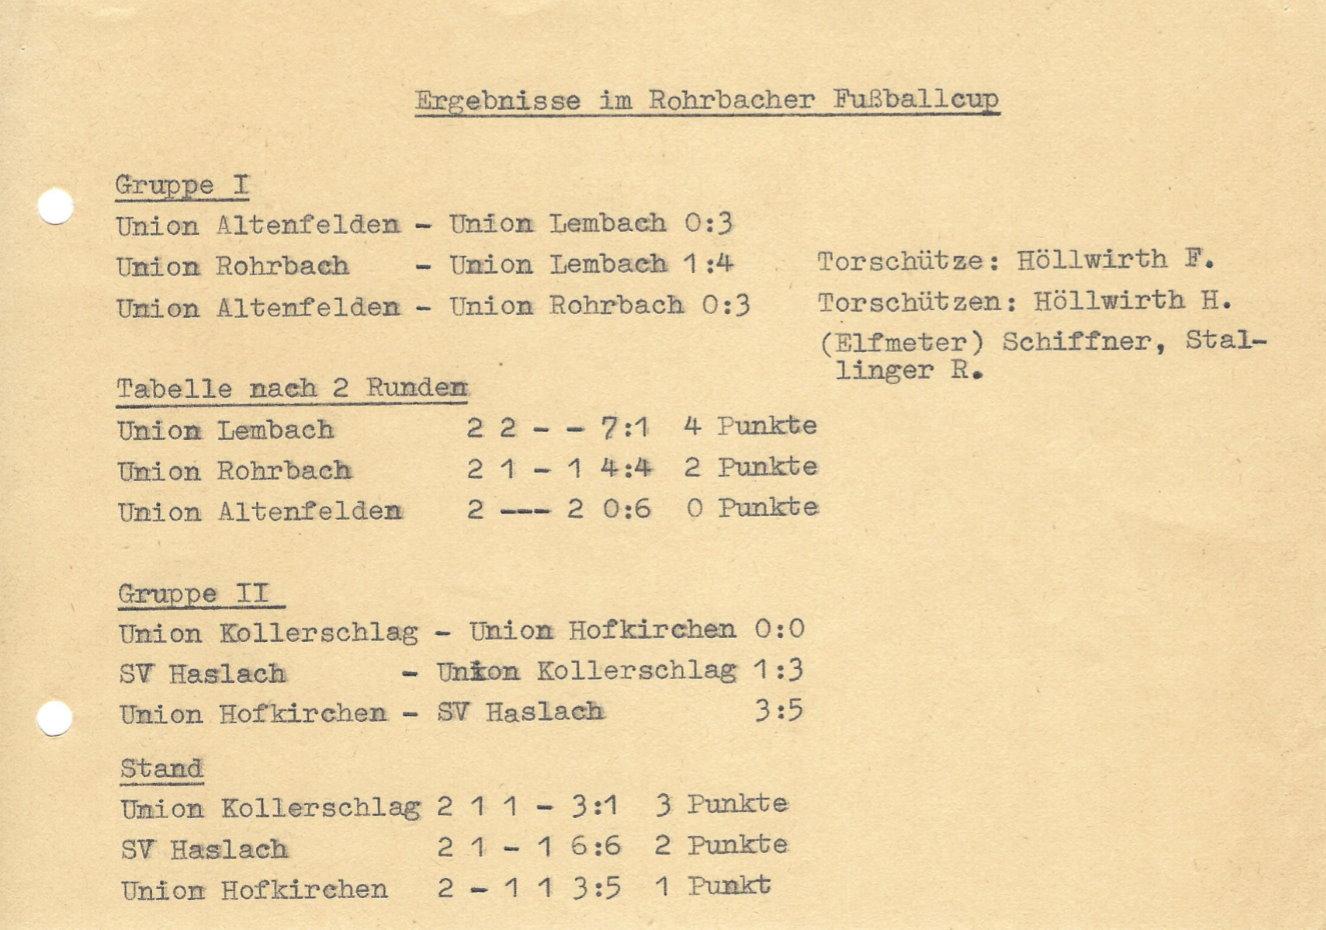 Sportunion Rohrbach-Berg - Saison 1967/68